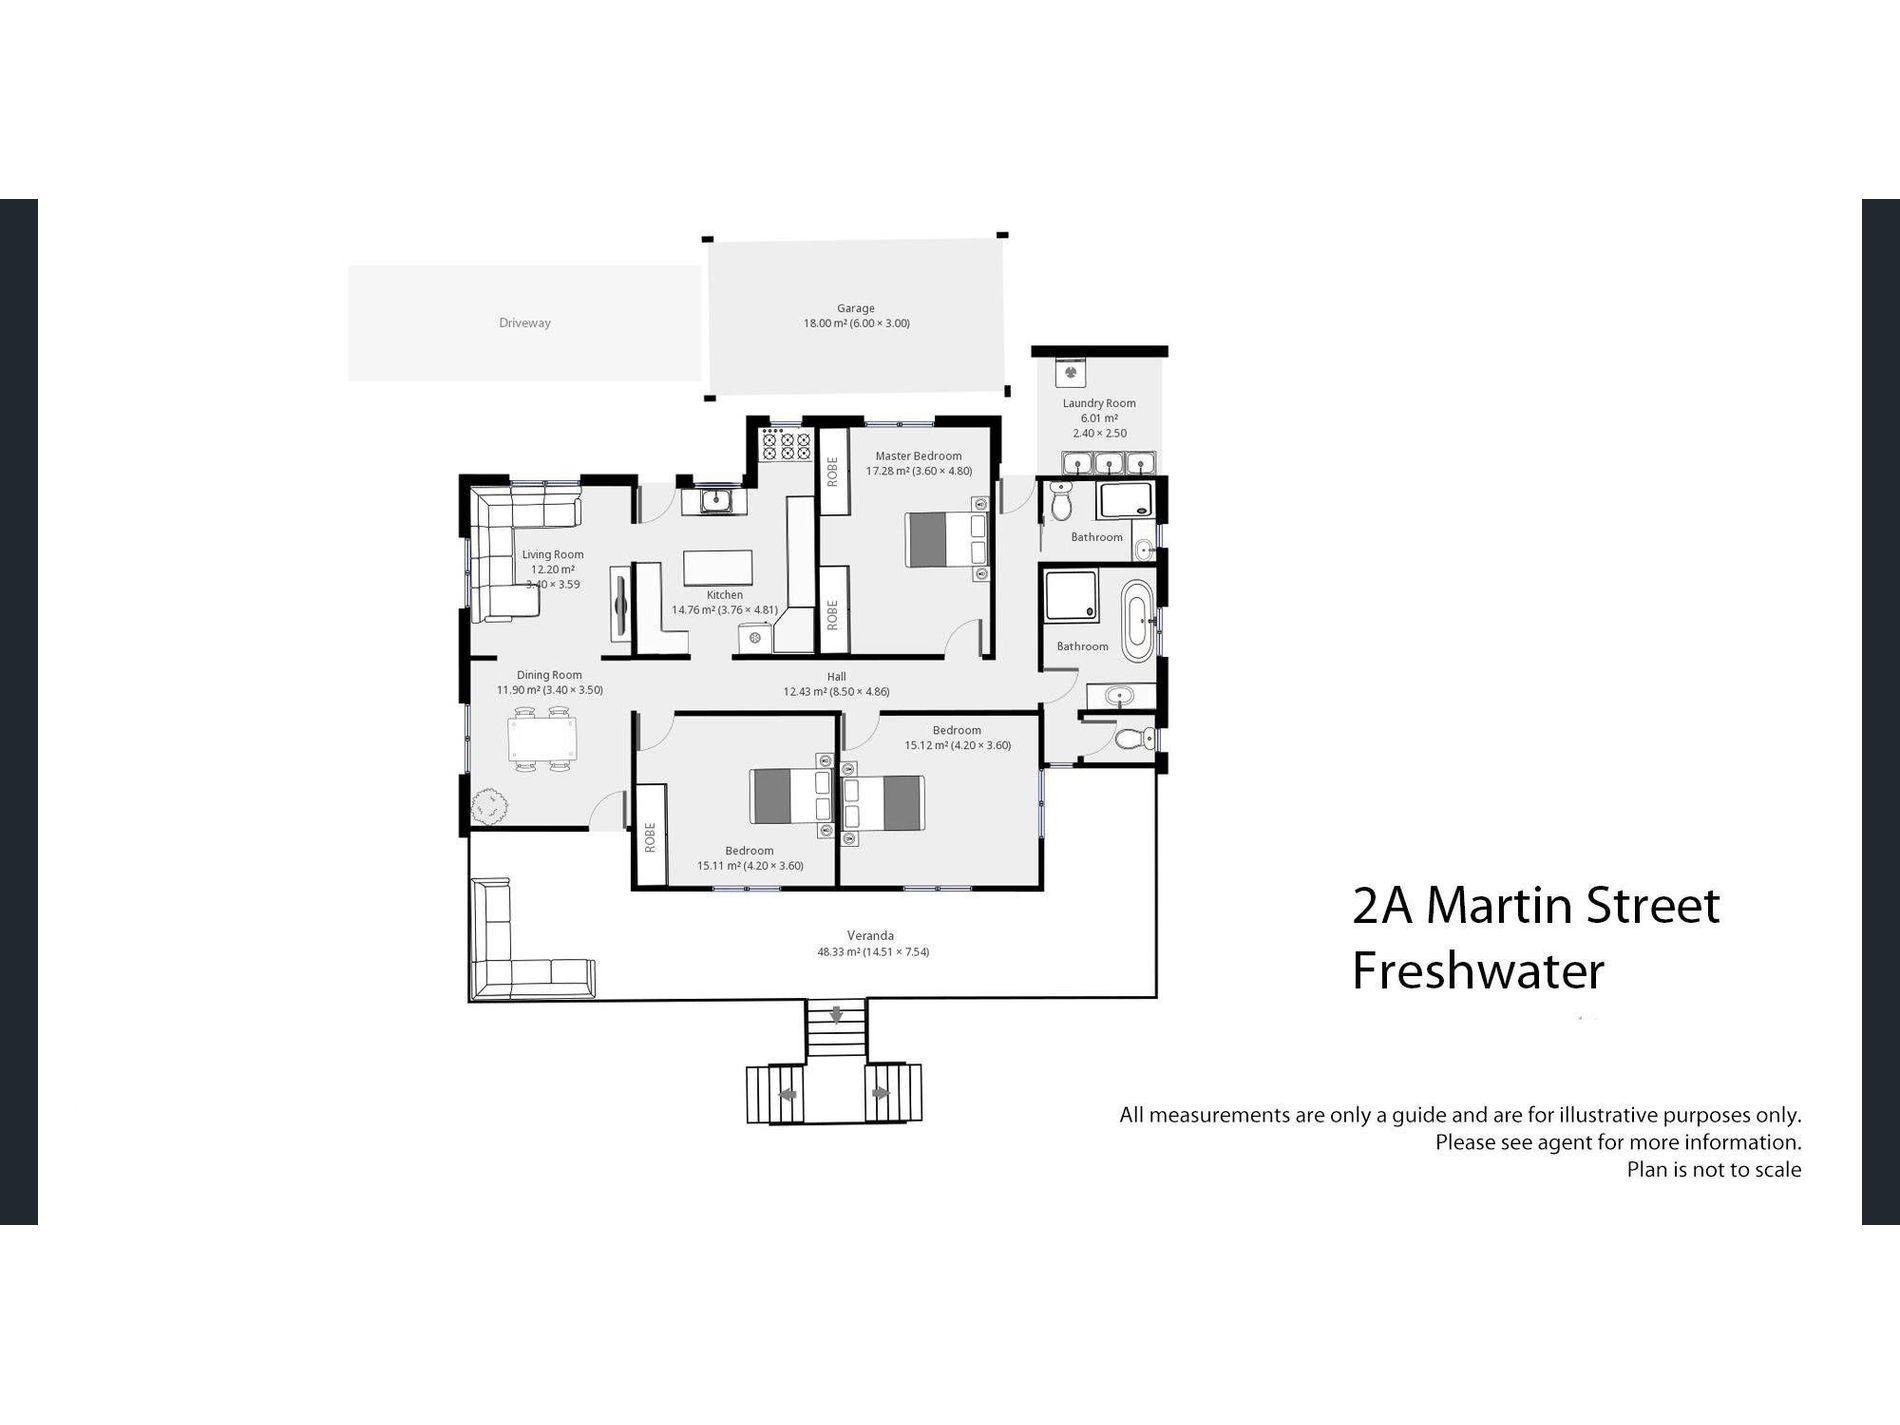 2A Martin Street, Freshwater